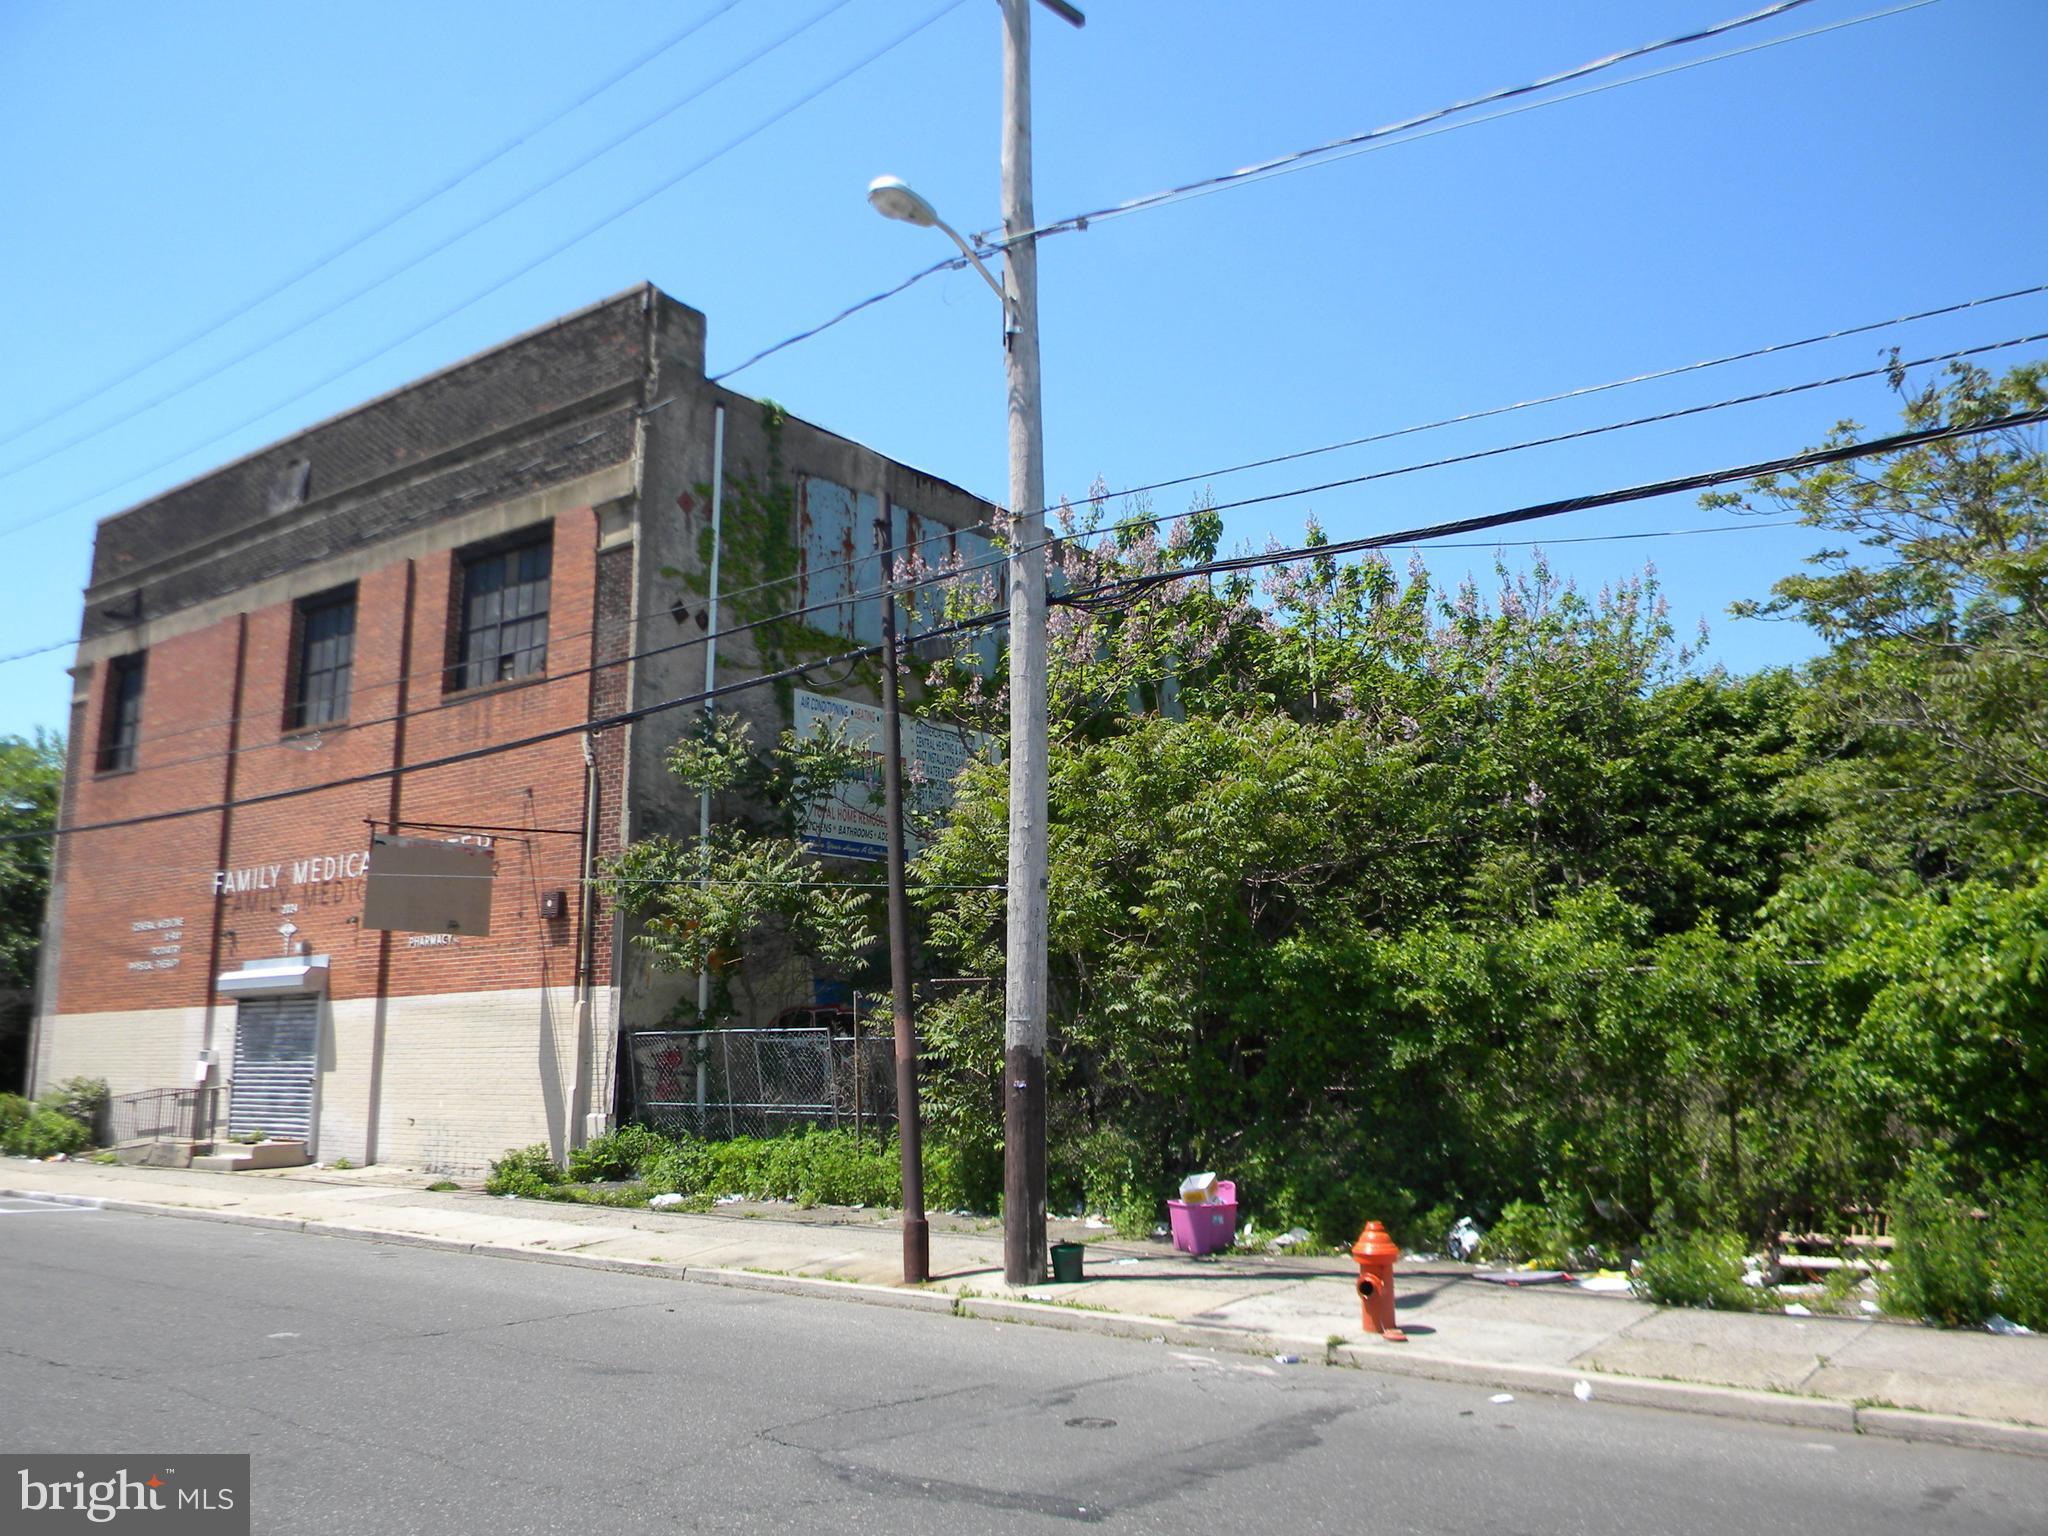 2024 N 22ND STREET, PHILADELPHIA, PA 19121